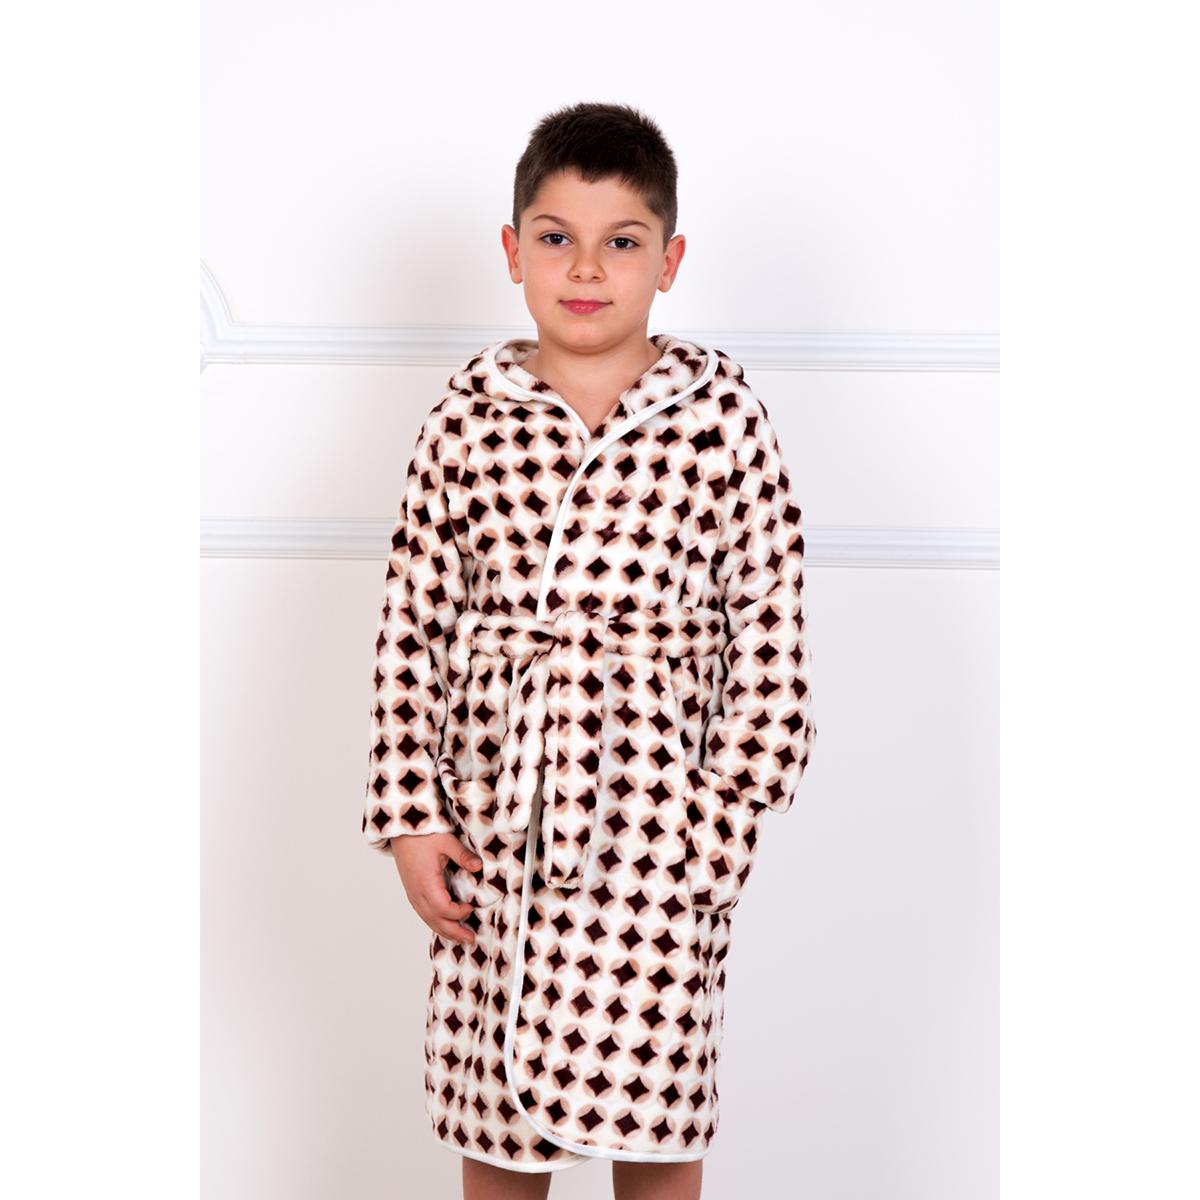 Детский халат Ромбик, размер 30Халаты<br><br><br>Тип: Дет. халат<br>Размер: 30<br>Материал: Ультрасофт